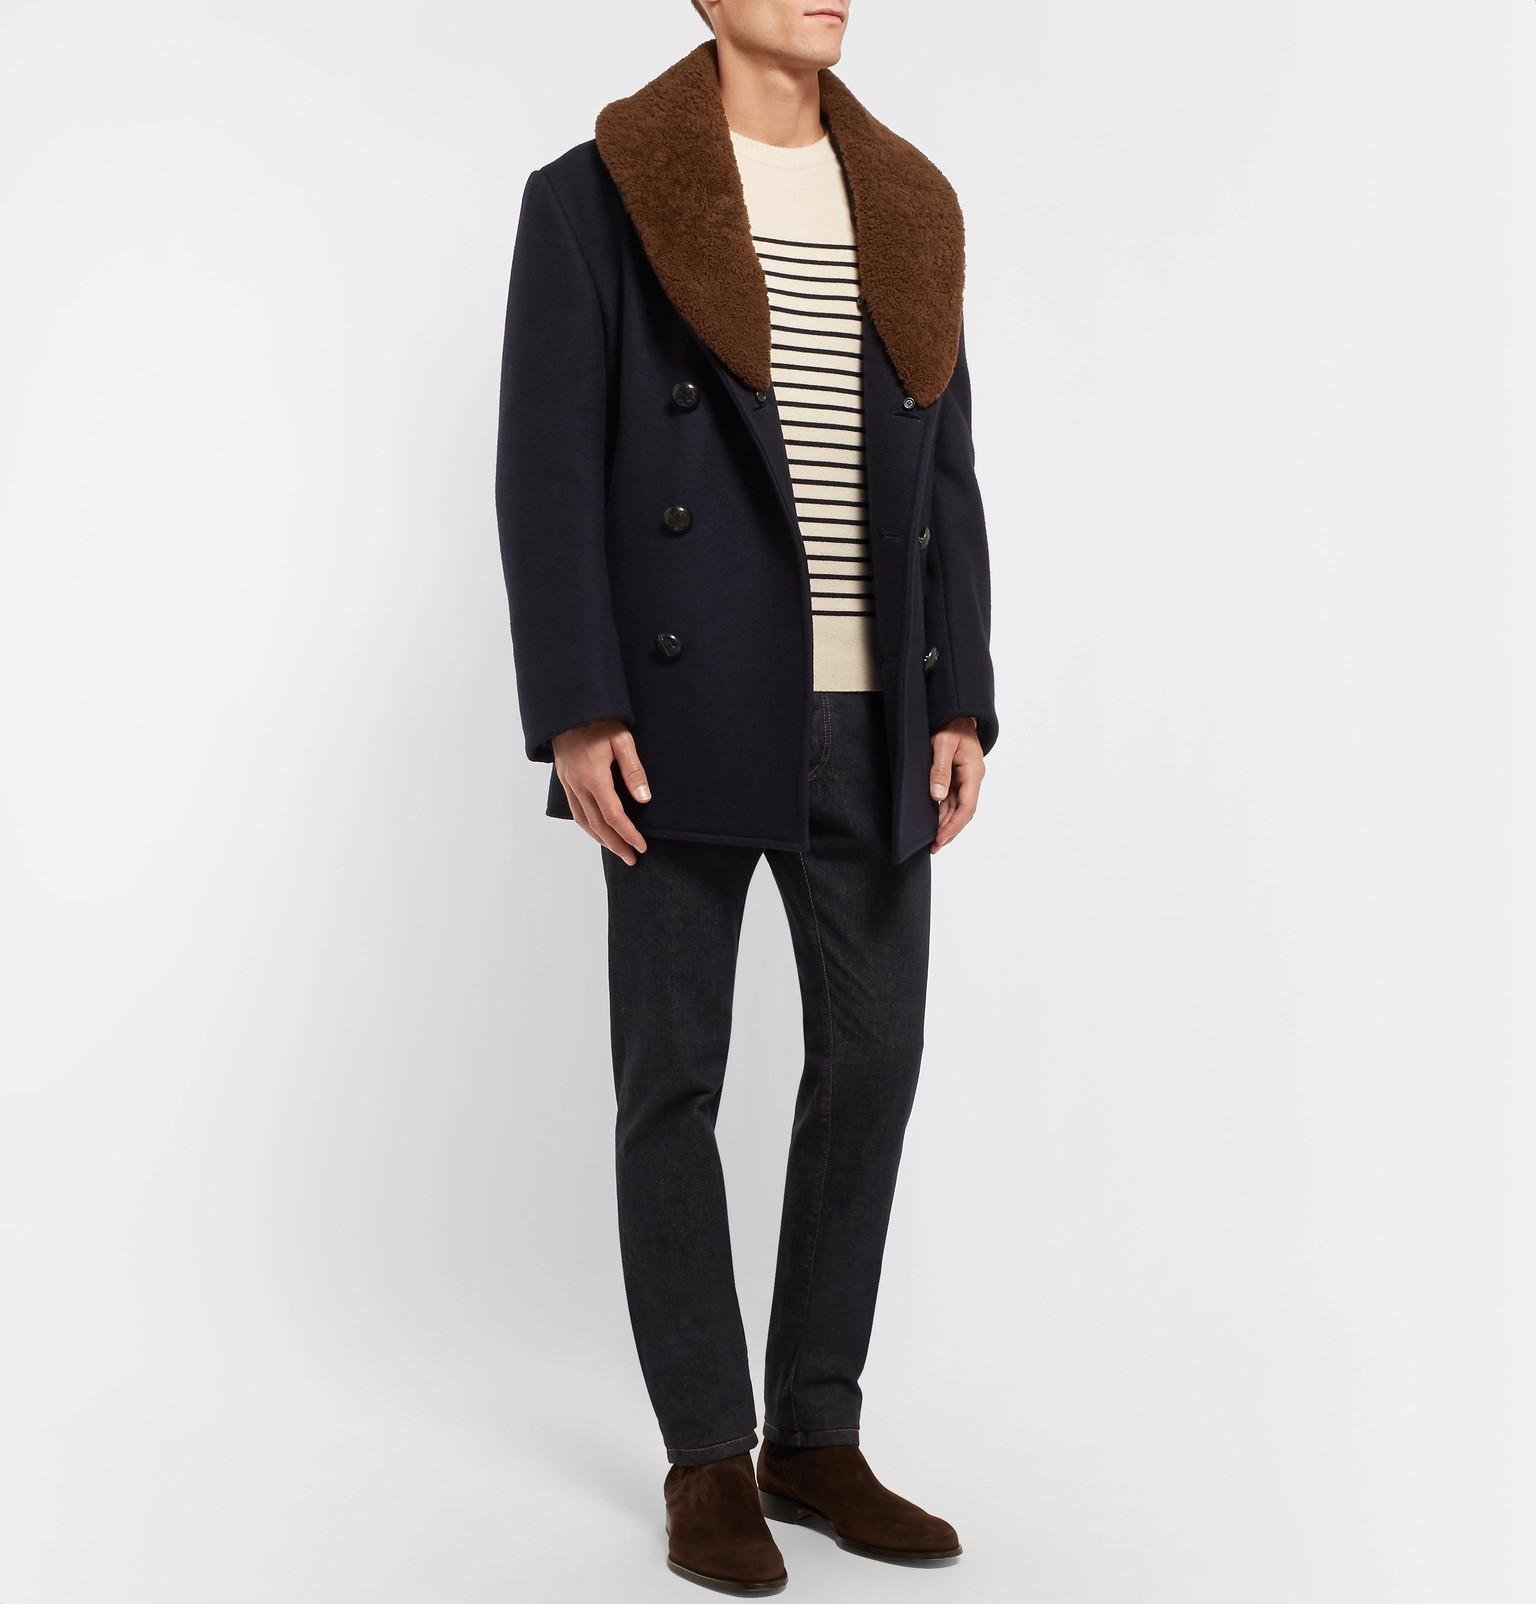 View Men Cashmere Coat Double Brioni Blue For Breasted Shearling Felt Trimmed Fullscreen npnRxzw